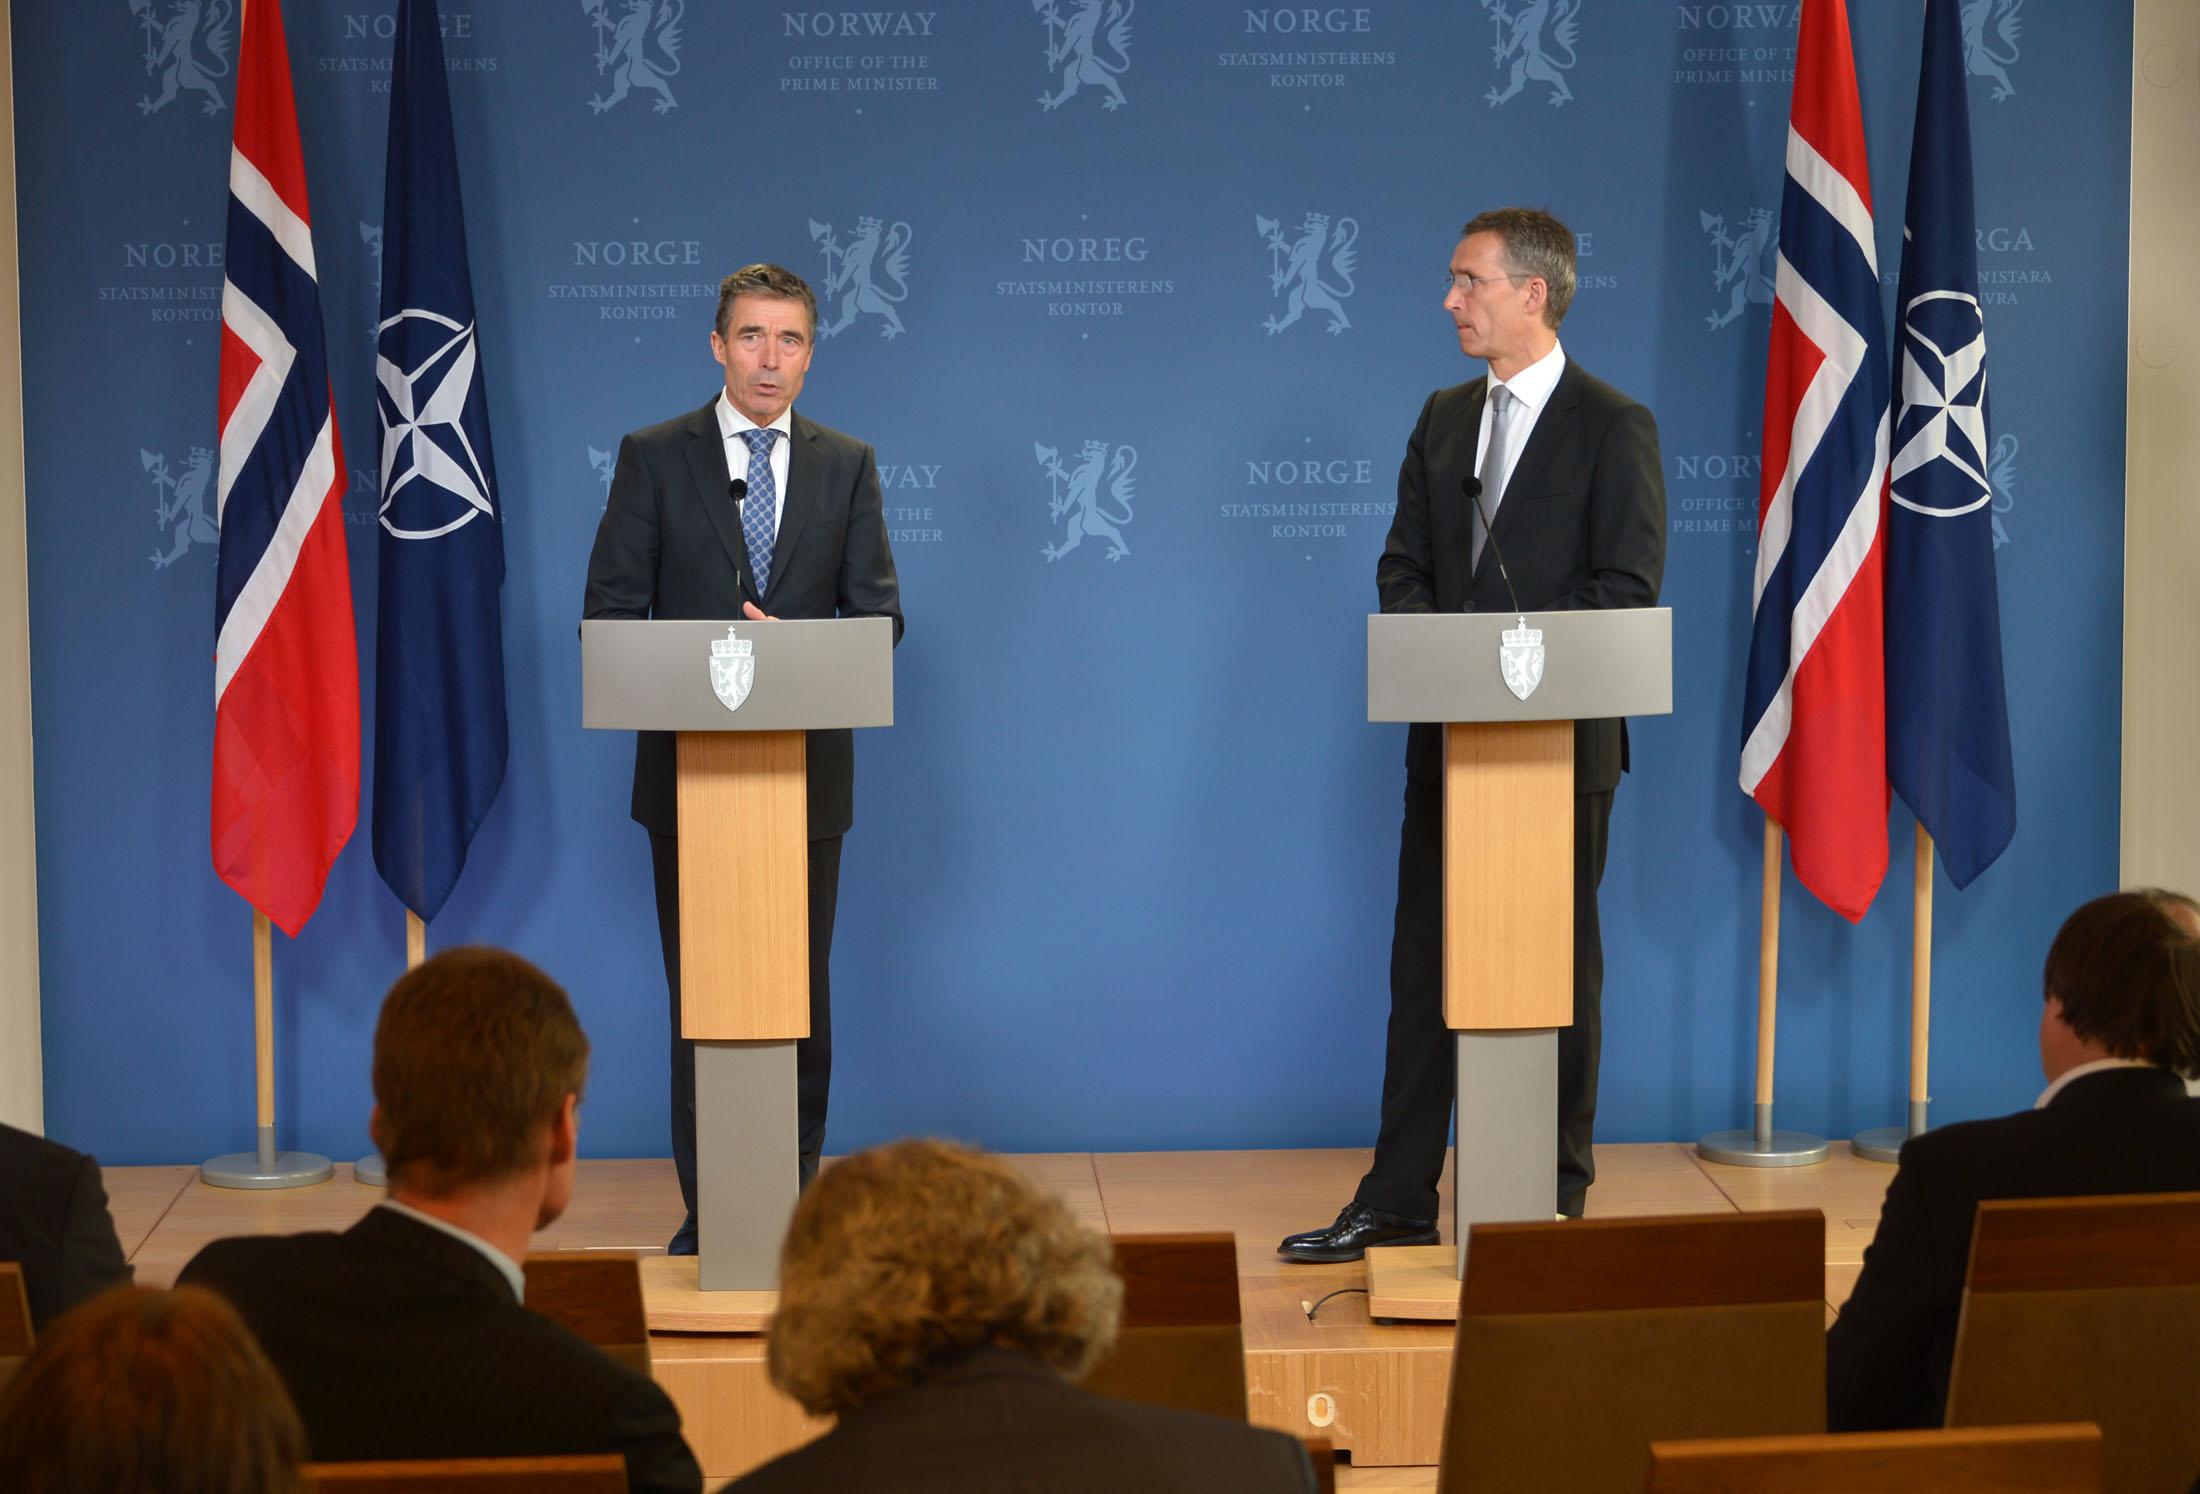 NATO Secretary General Anders Fogh Rasmussen meets then Norwegian Prime Minister Jens Stoltenberg